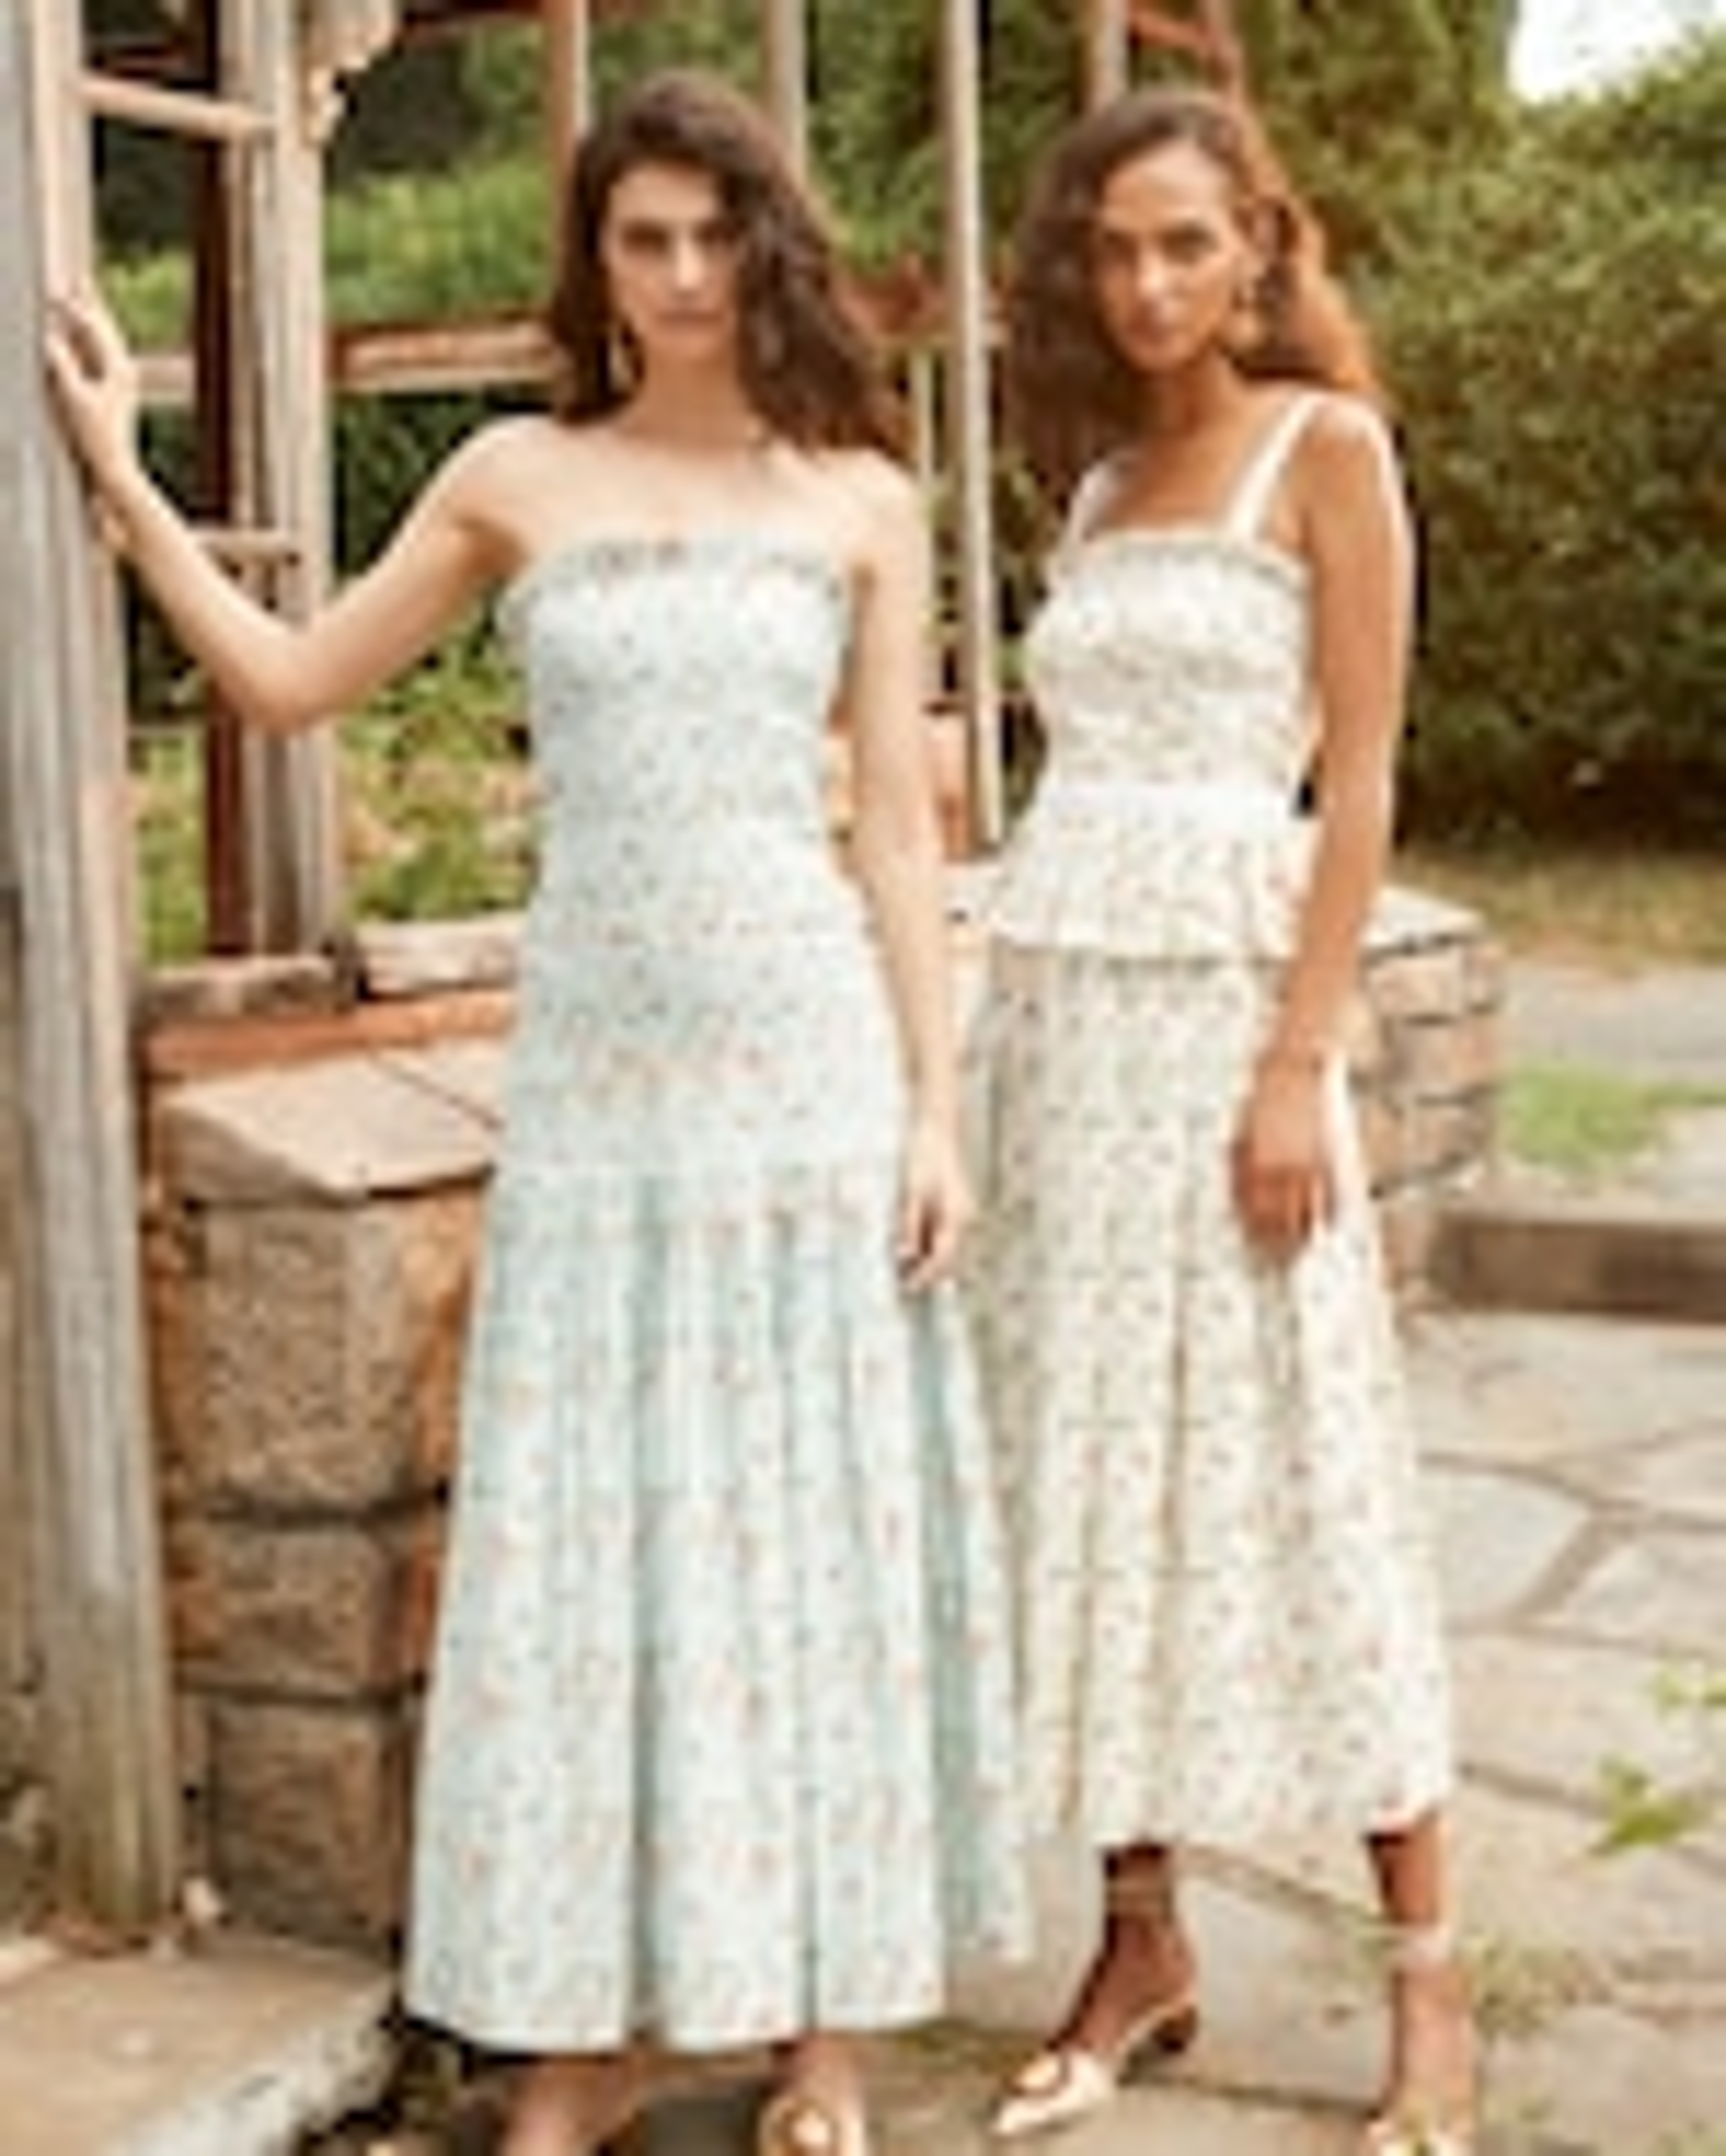 Amur Hiyori Strapless Dress 4